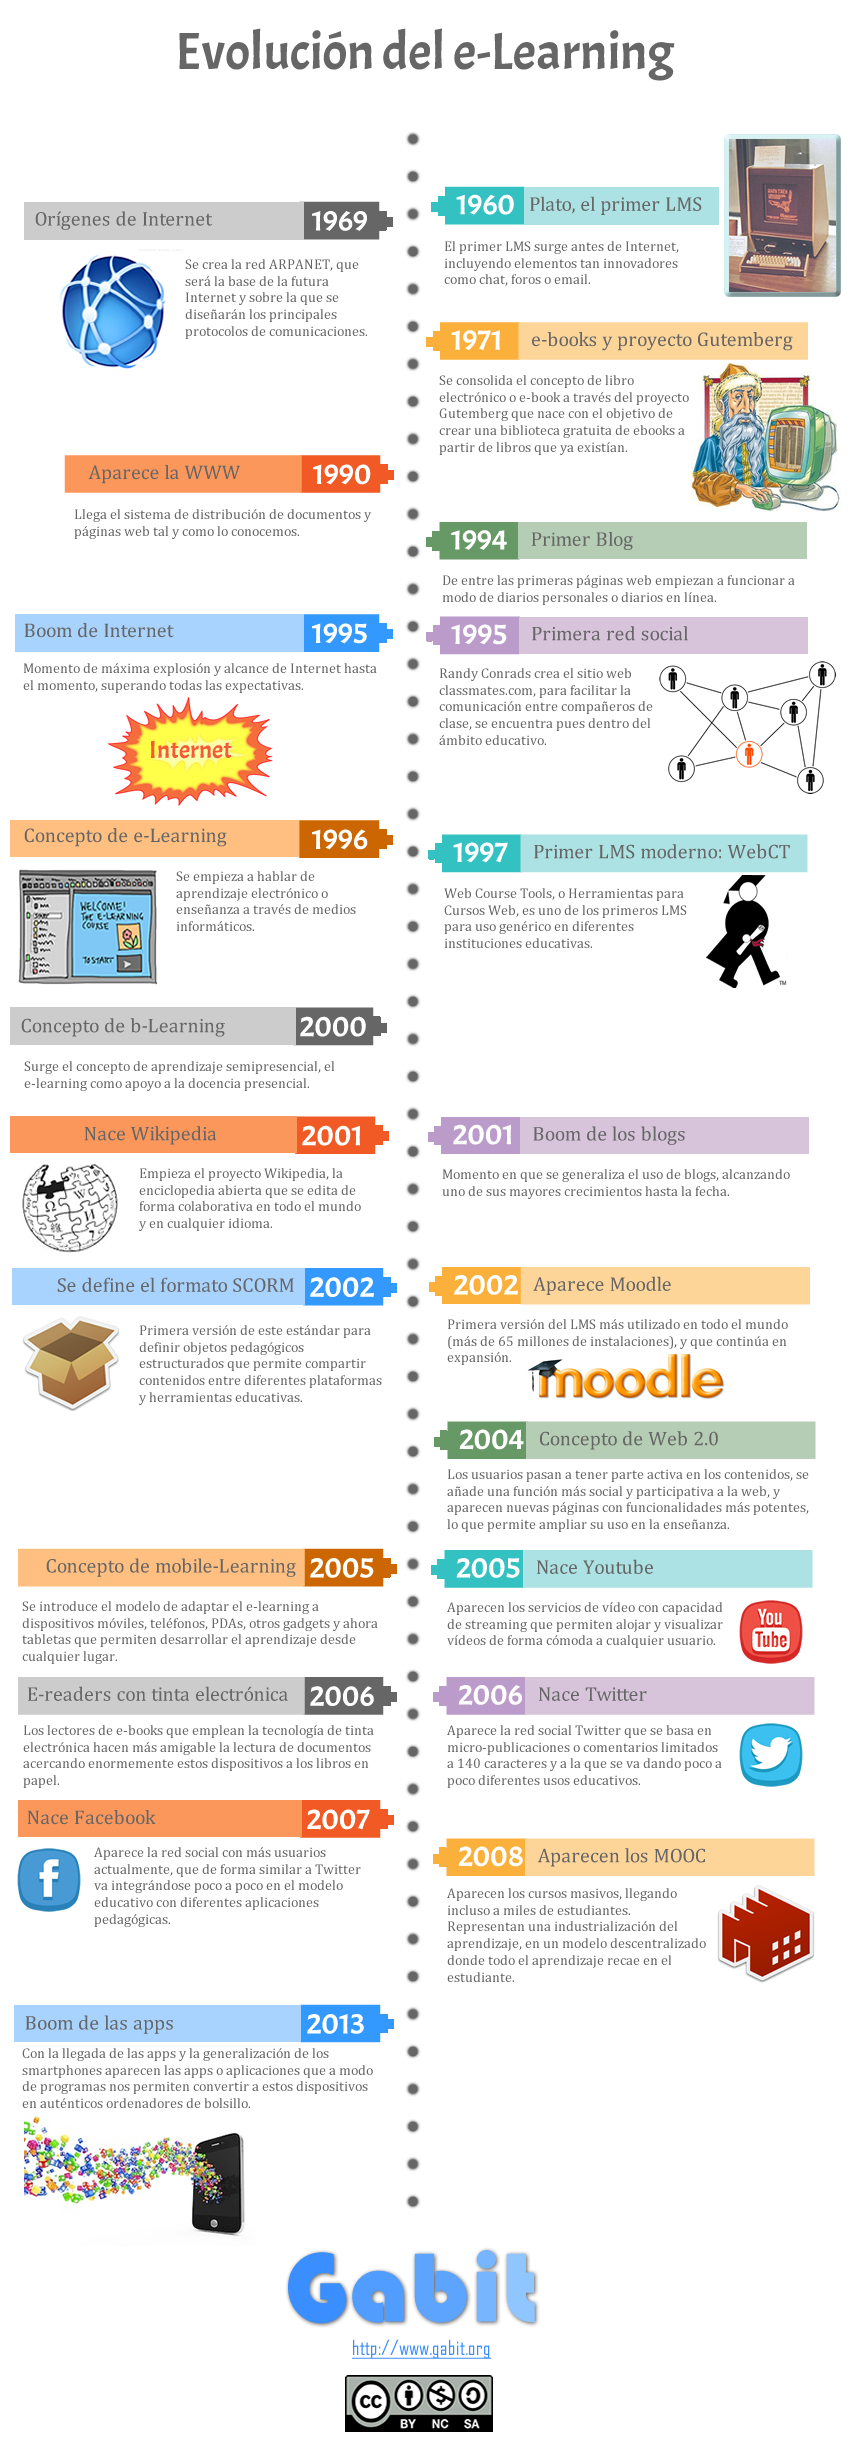 Infografía sobre la evolución del e-learning